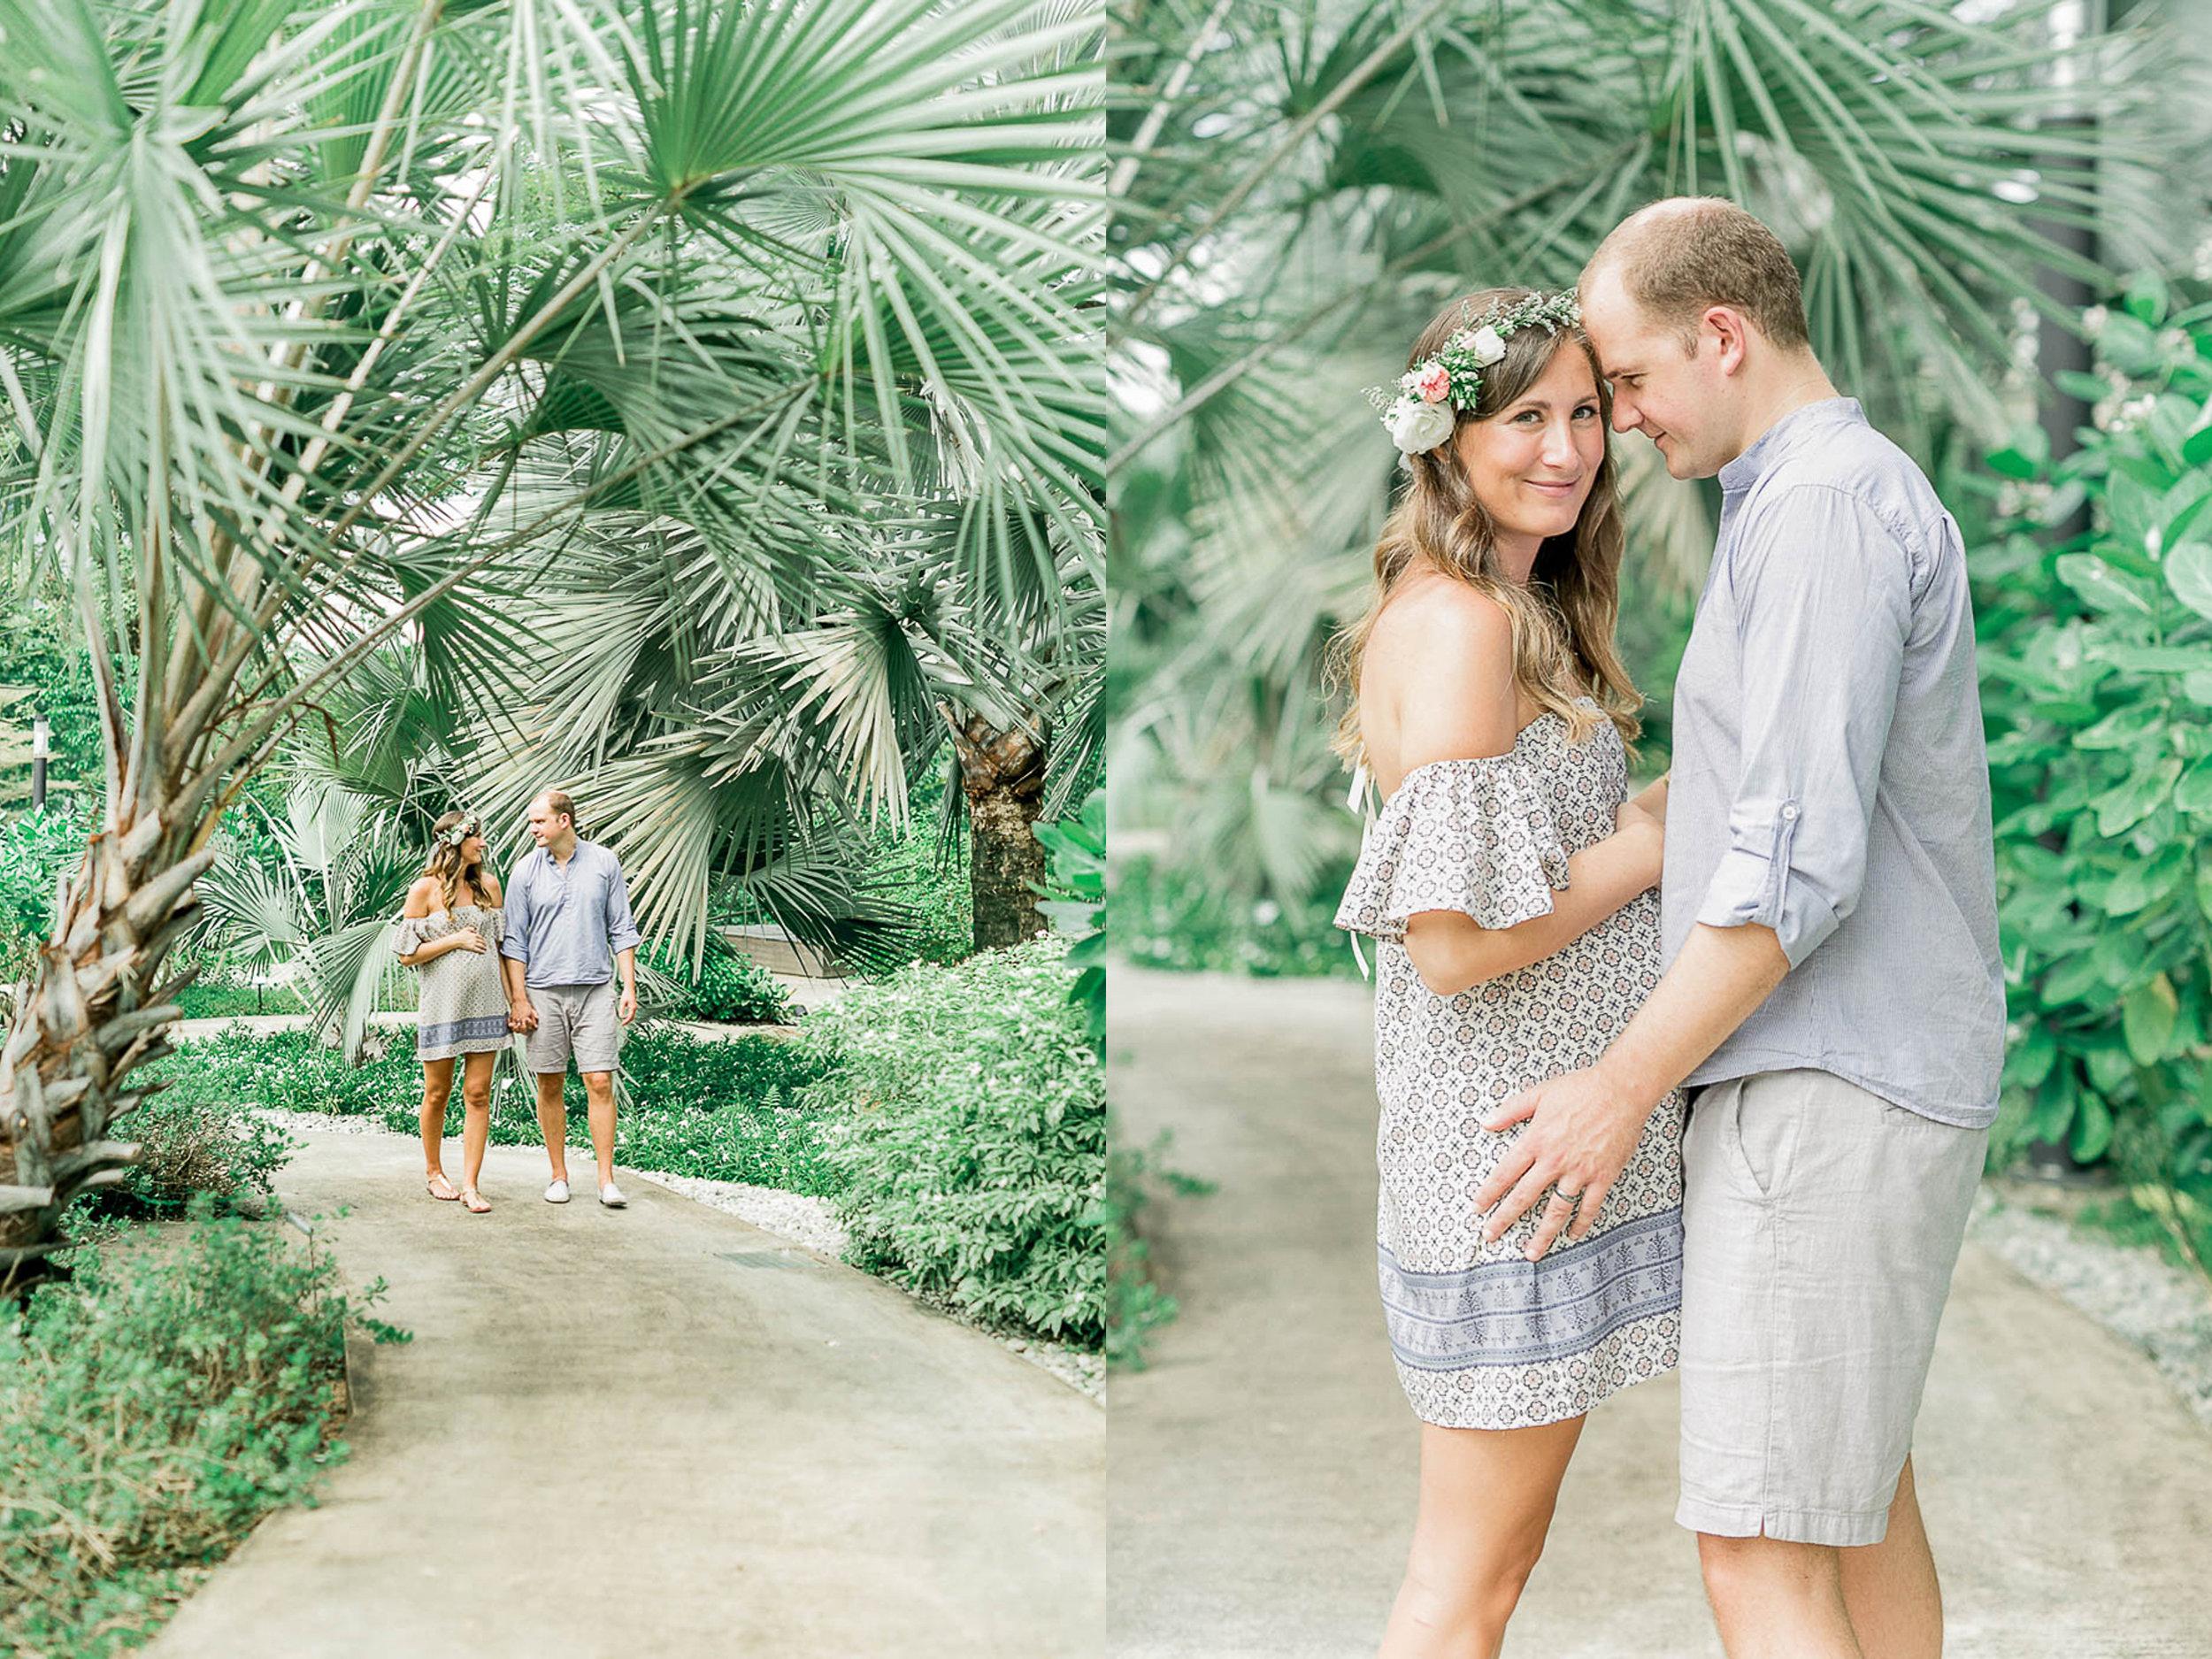 maternity-photographer-singapore-film-photographer-chen-sands-marisa-3.jpg